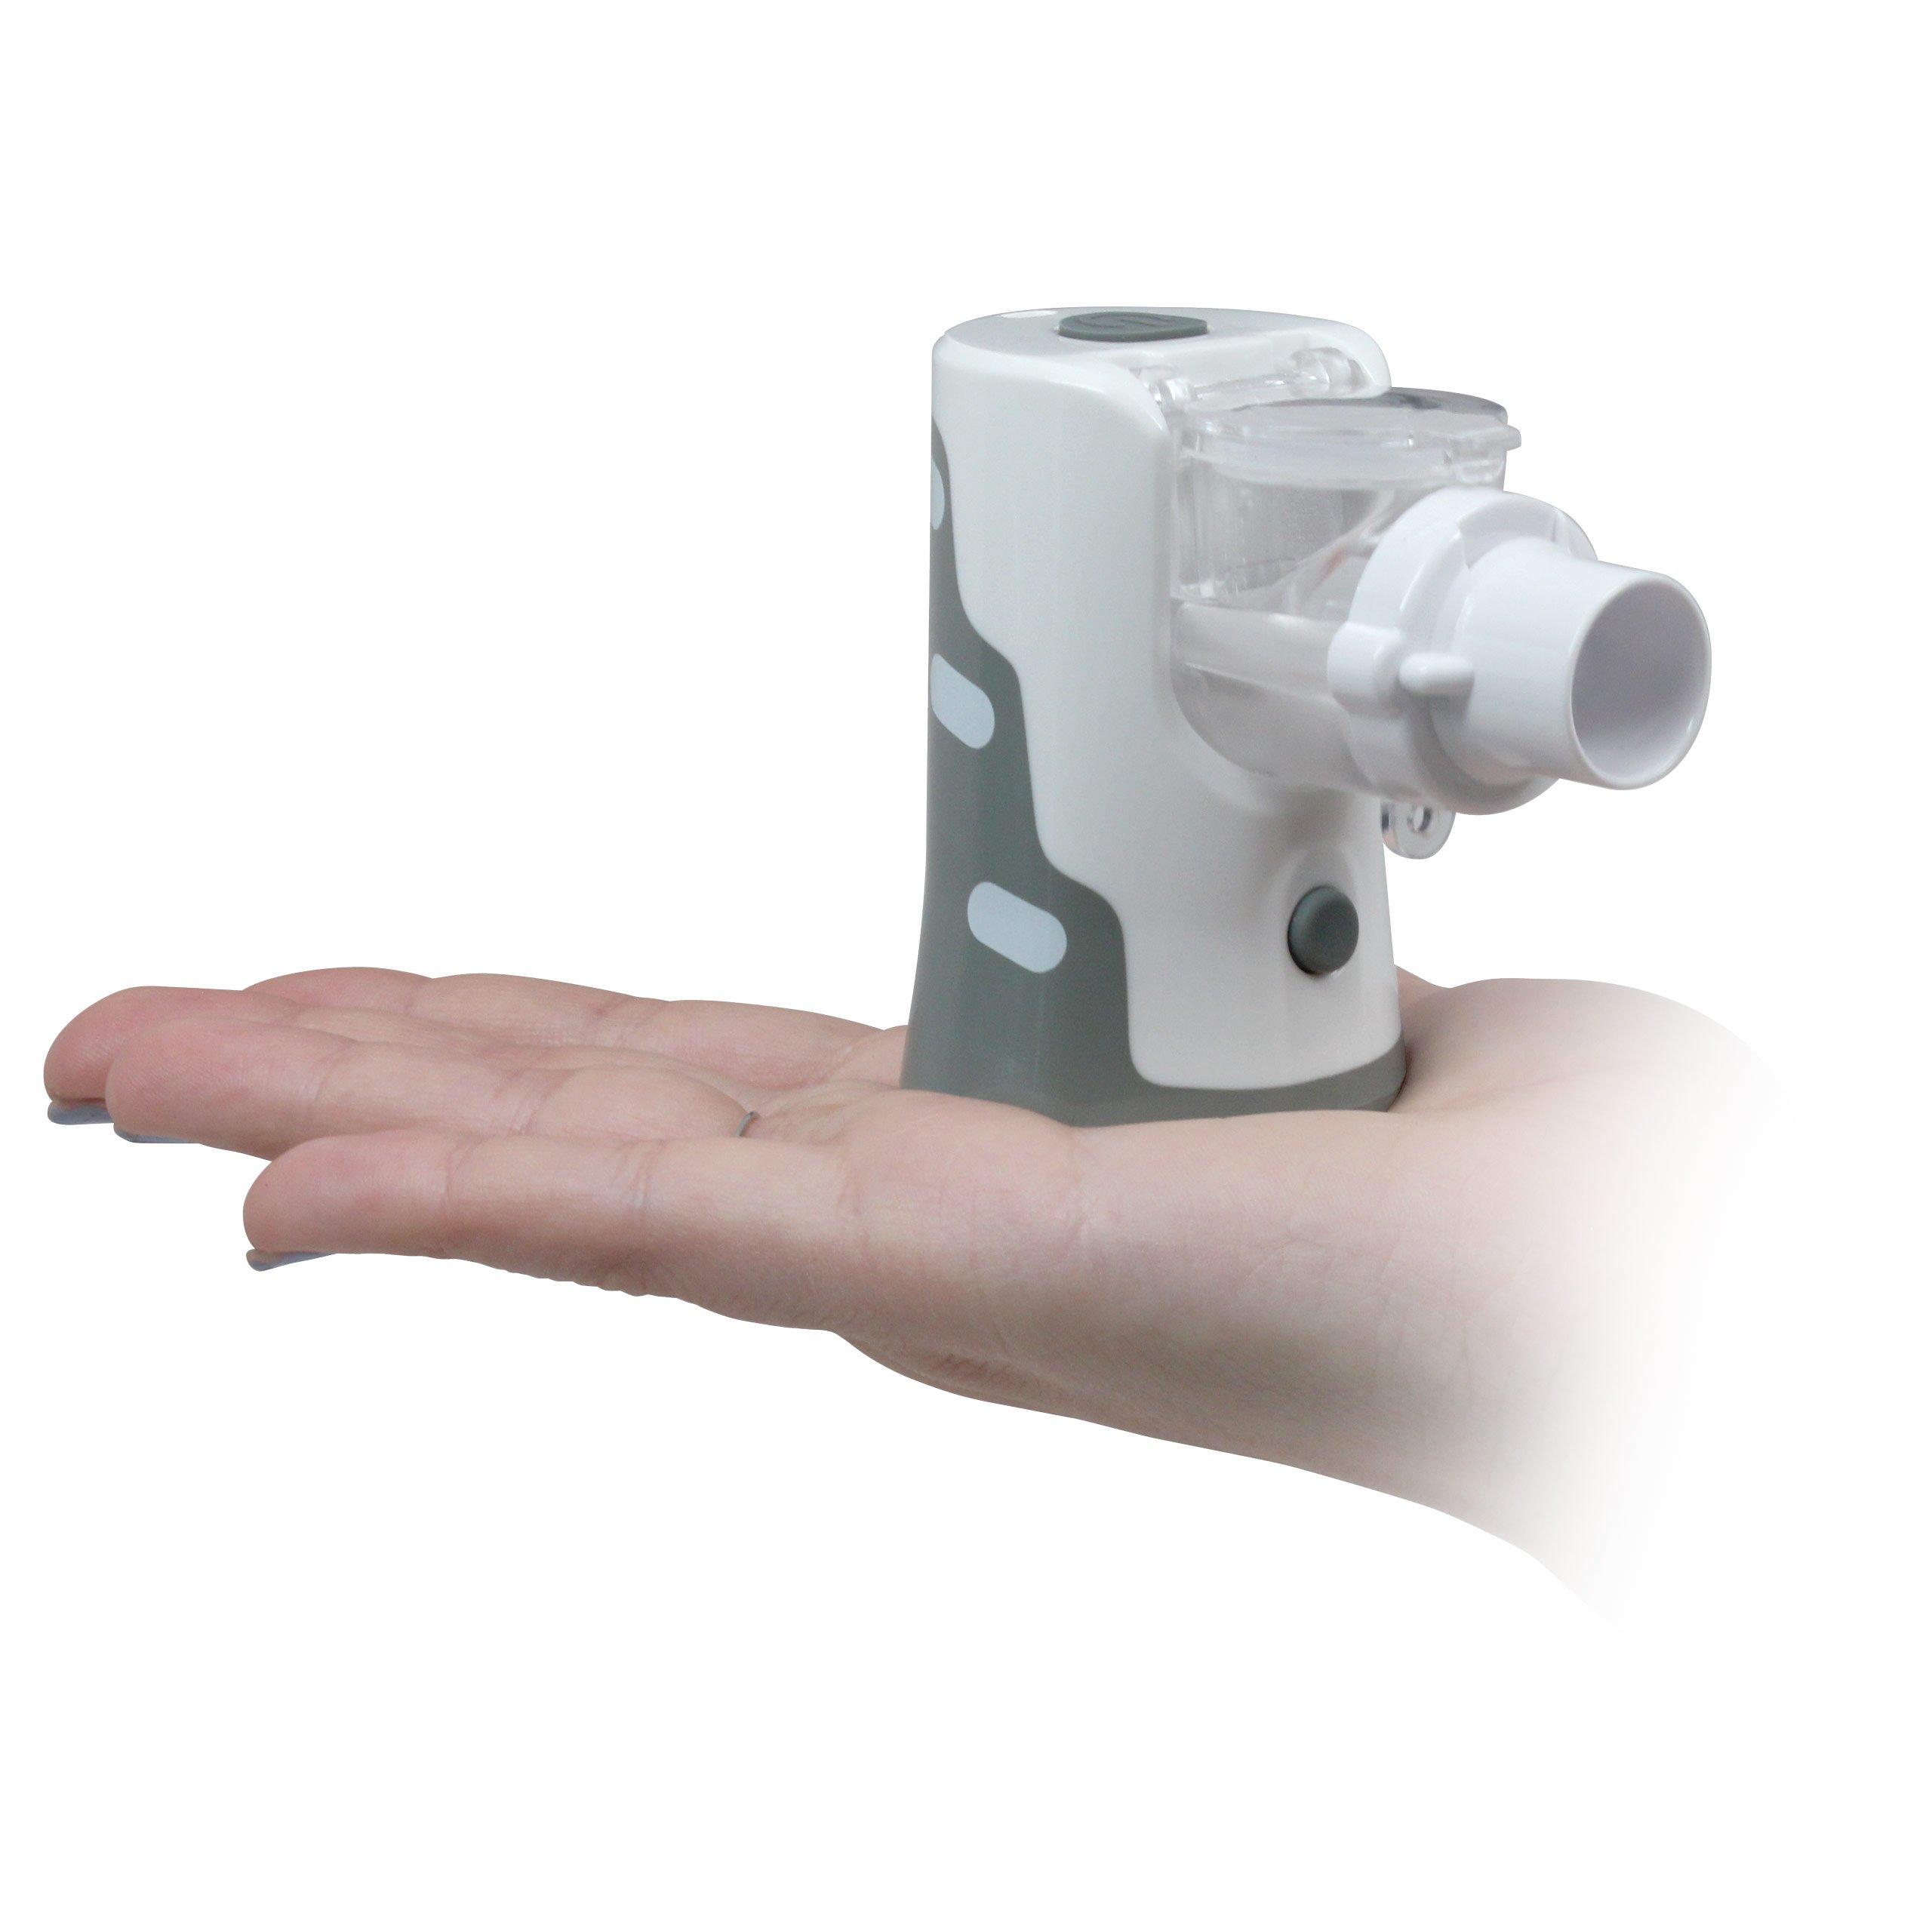 Buy Sunset Mini Mesh Nebulizer Machine - Portable Nebulizers